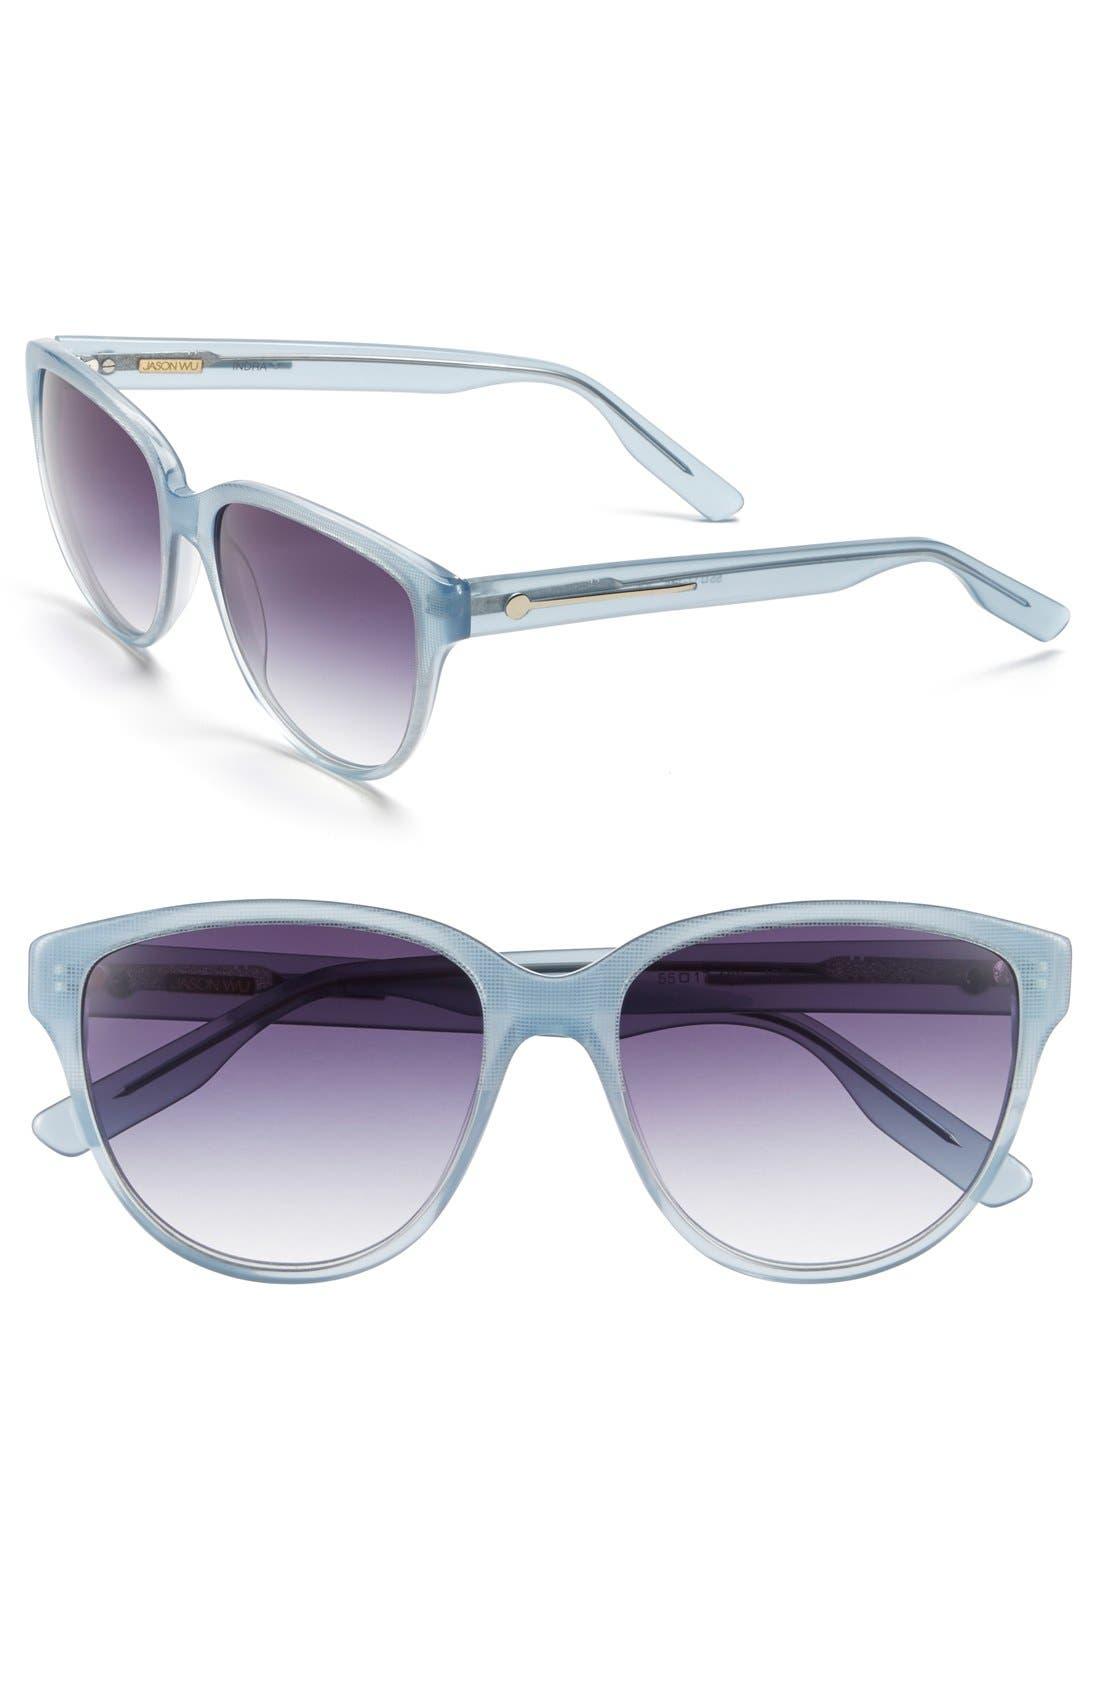 Main Image - Jason Wu 'Indra' 55mm Sunglasses